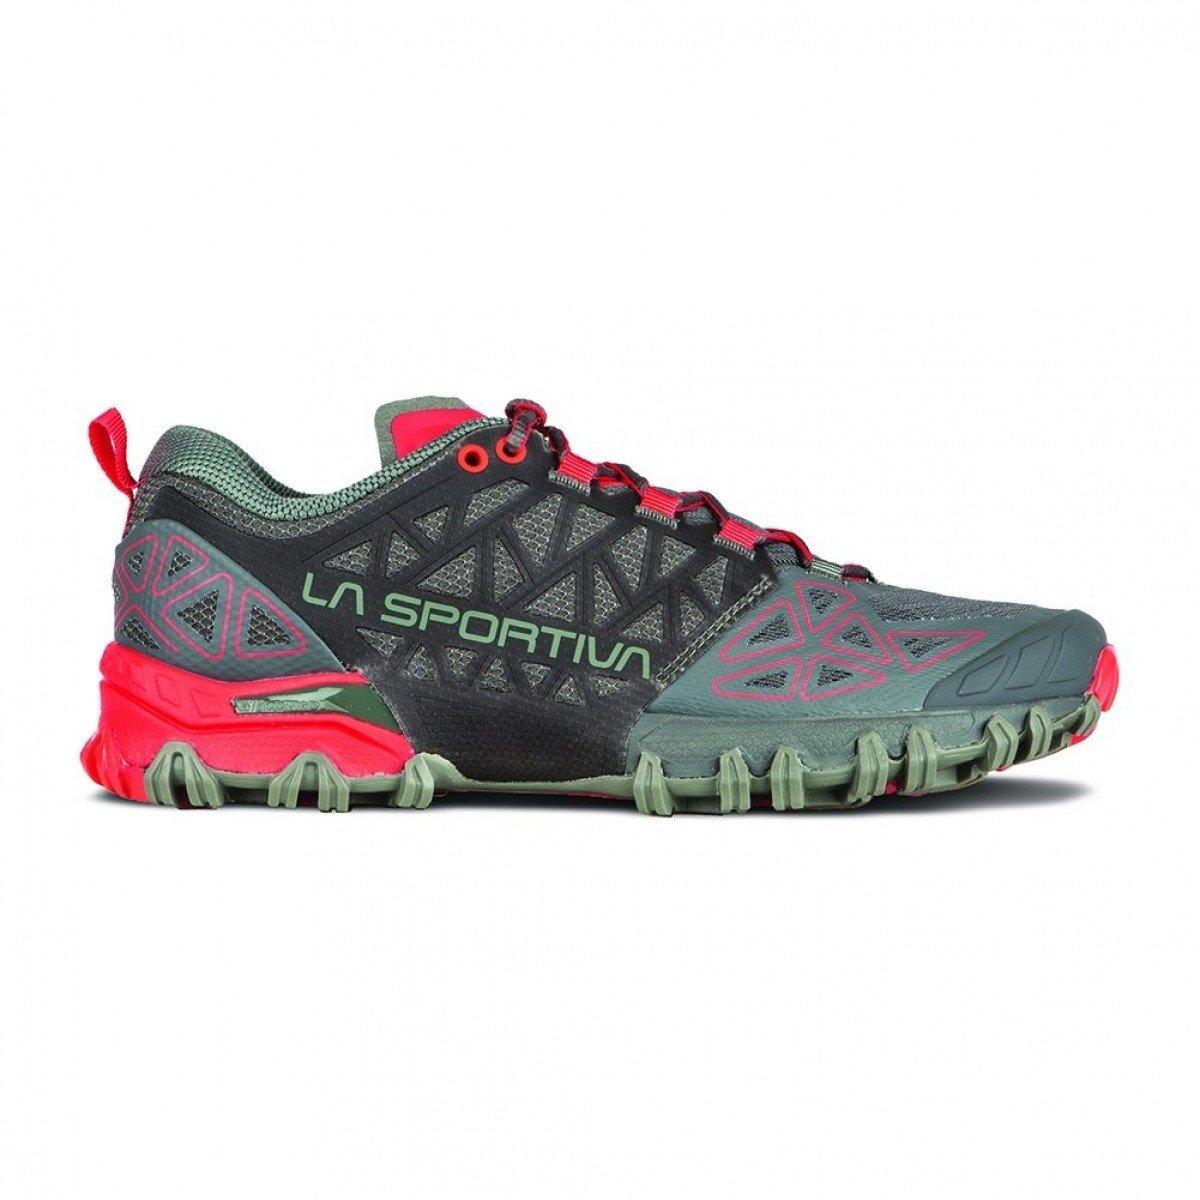 La Sportiva Bushido II Women's Trail Running Shoes